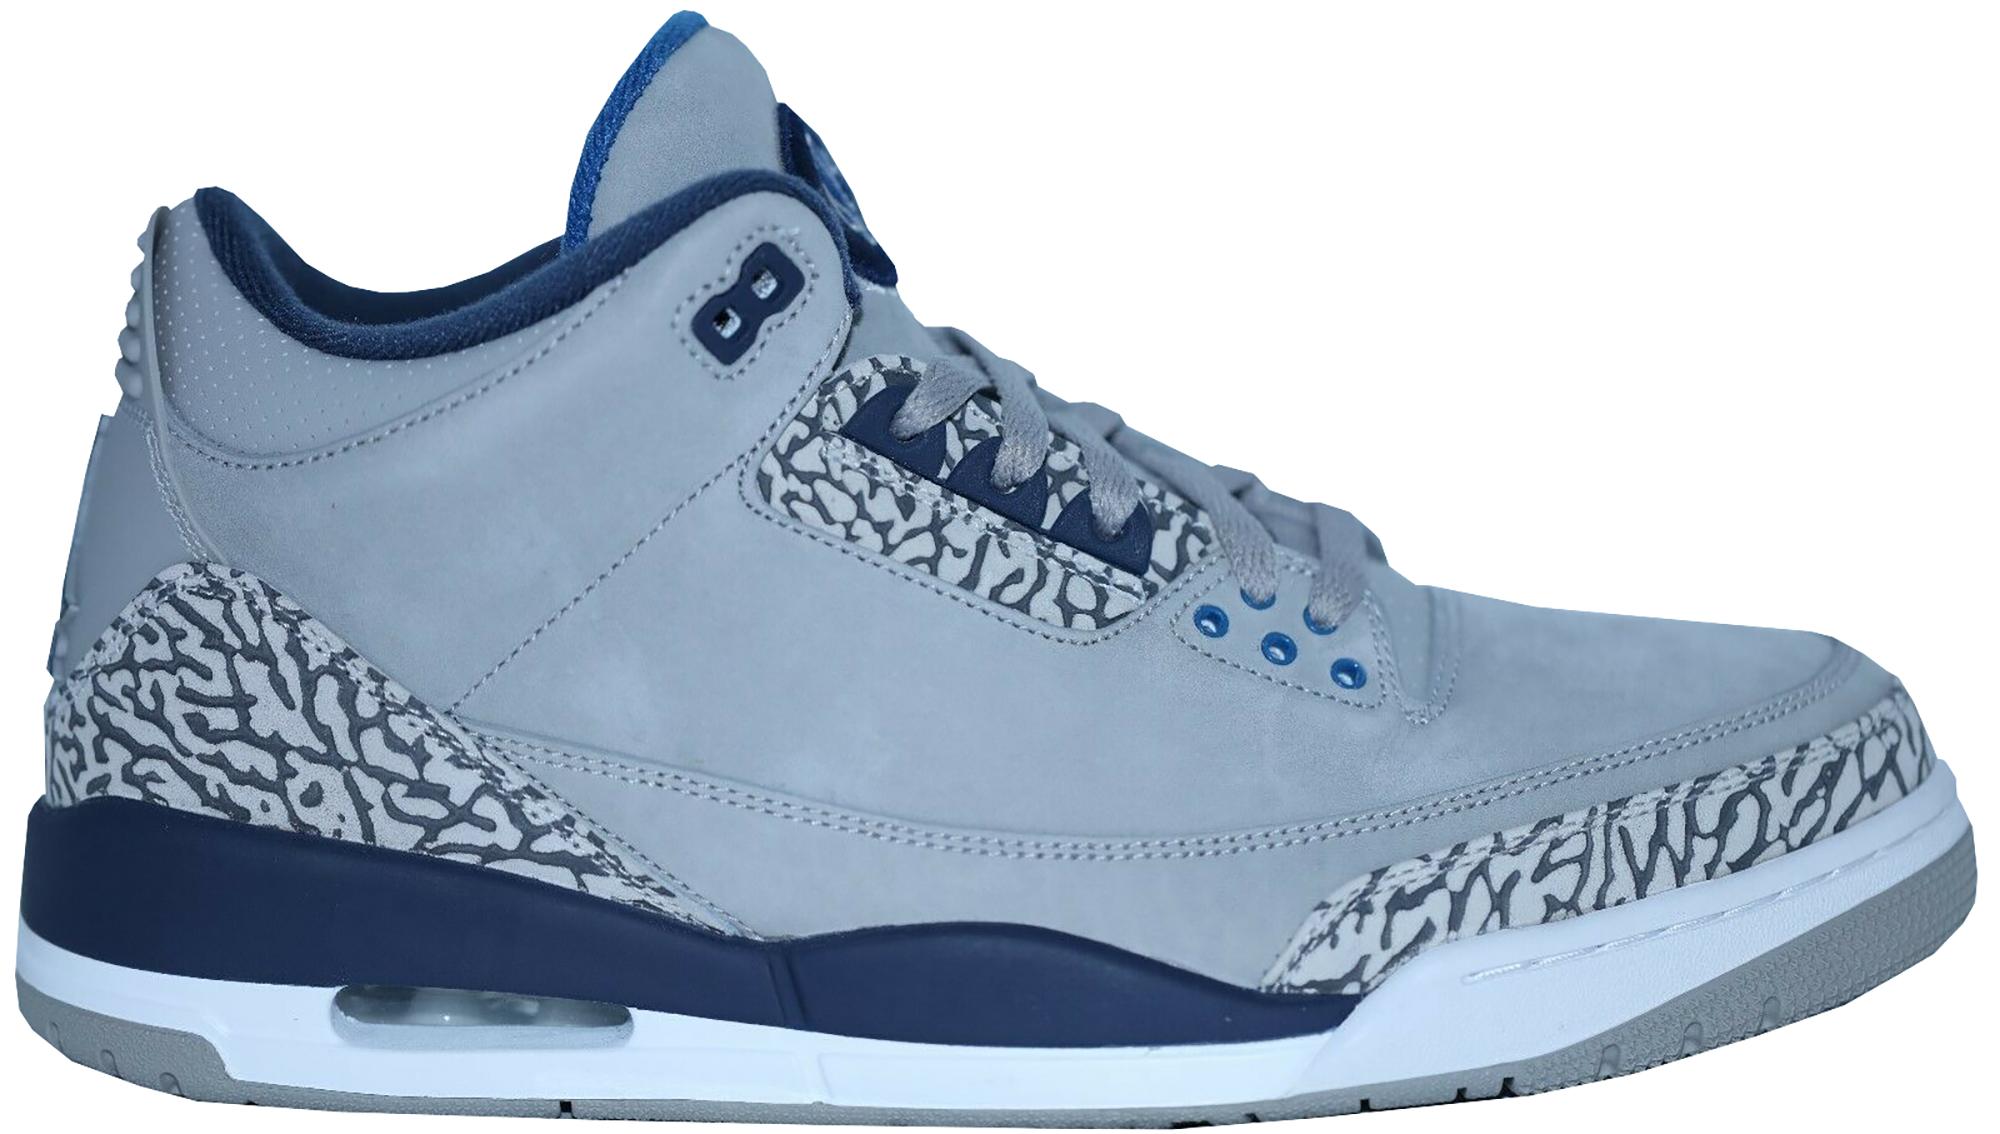 Jordan 3 Retro Georgetown (PE) - AJ3838946